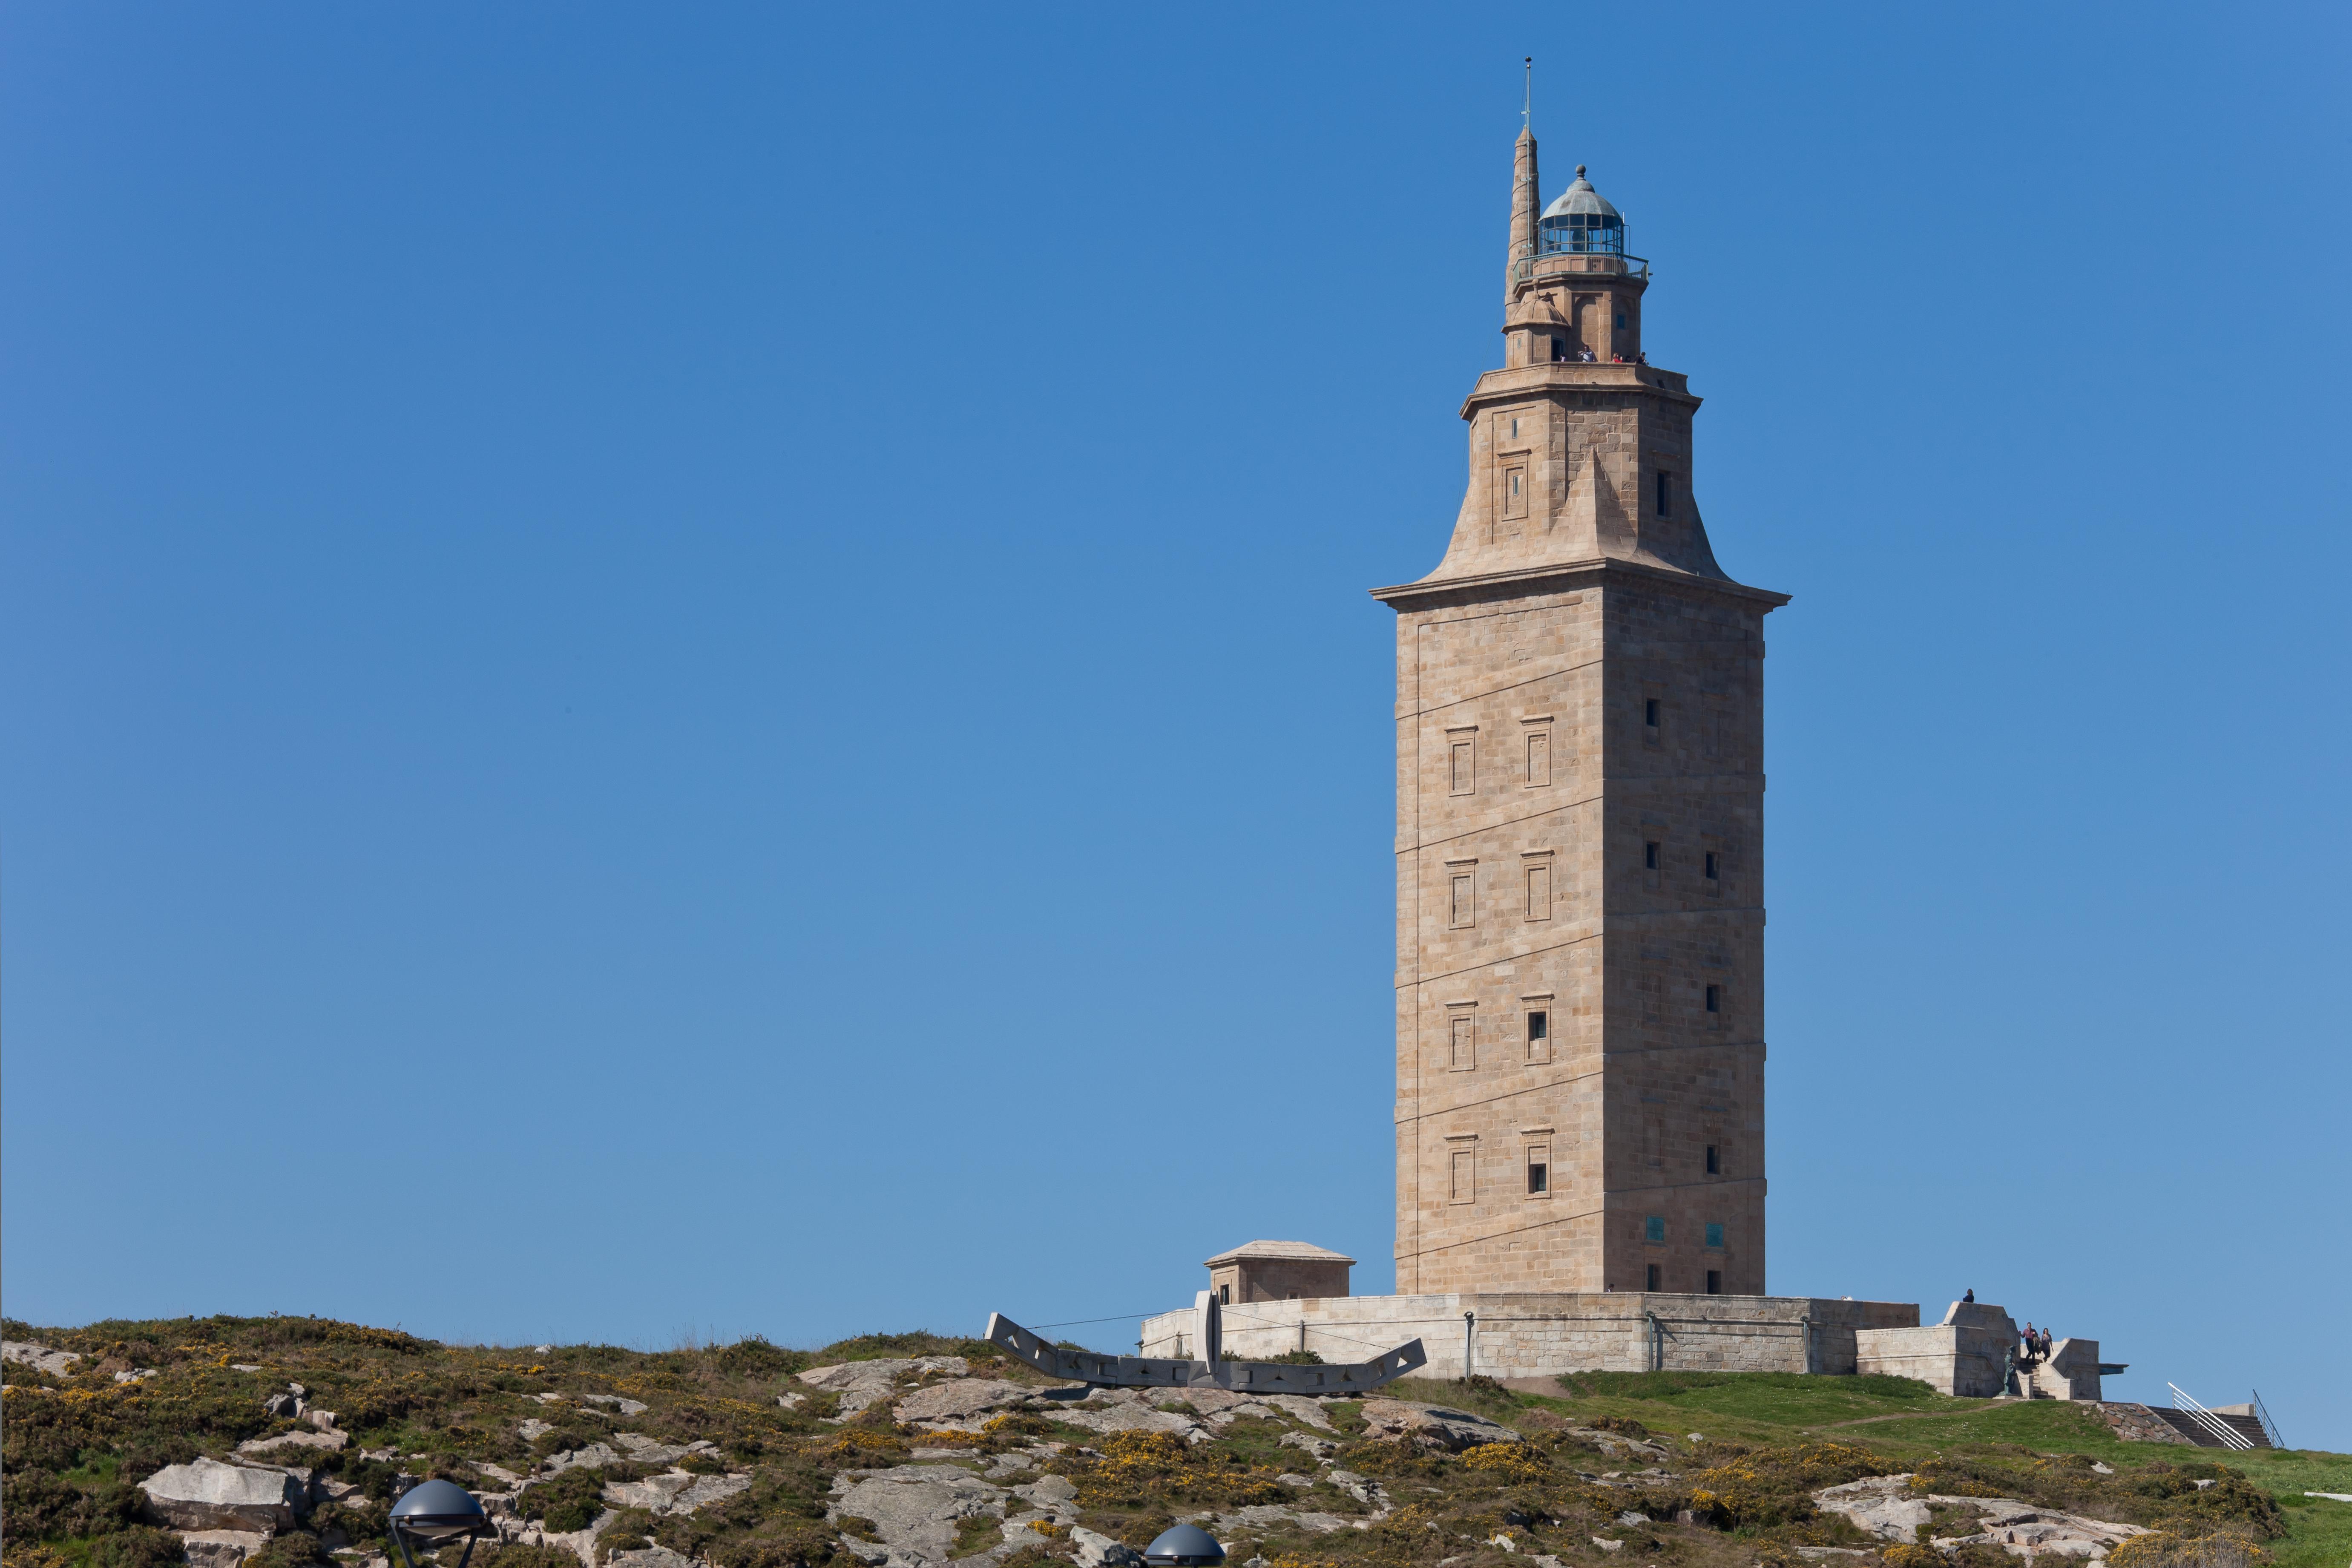 File:Torre de Hércules - DivesGallaecia2012-69.jpg - Wikimedia Commons